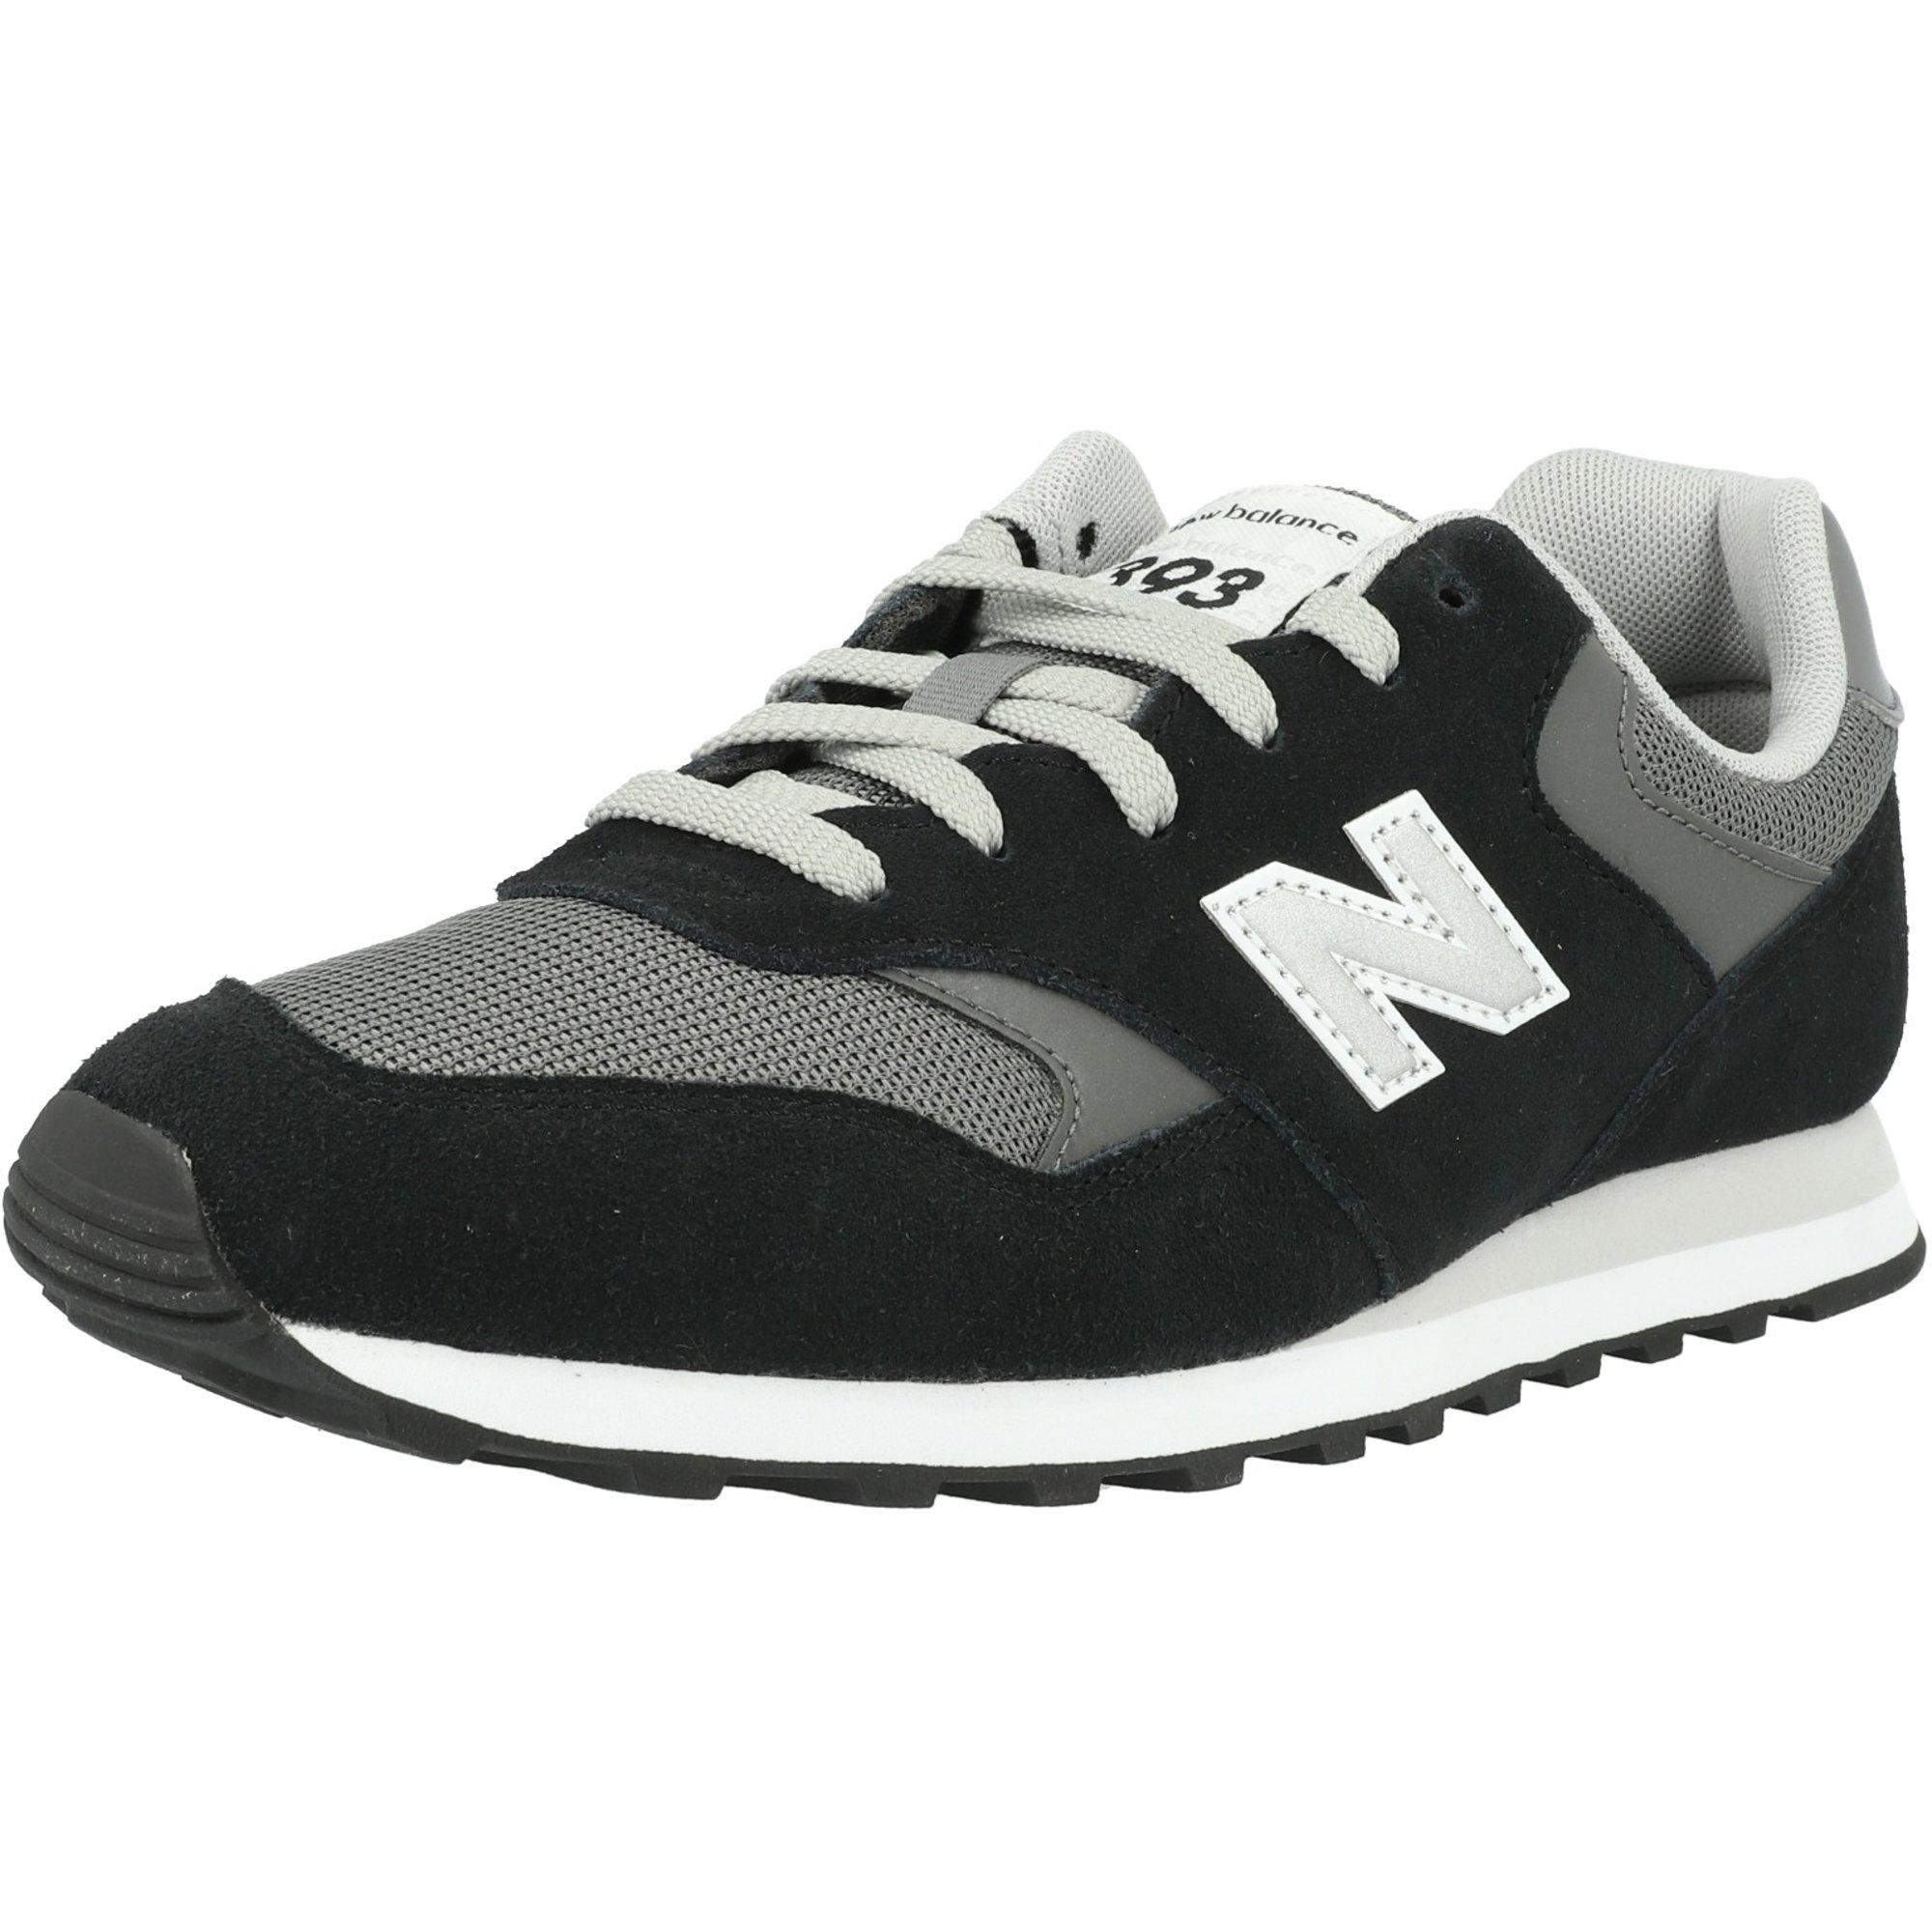 New Balance 393 Black/Castlerock Suede